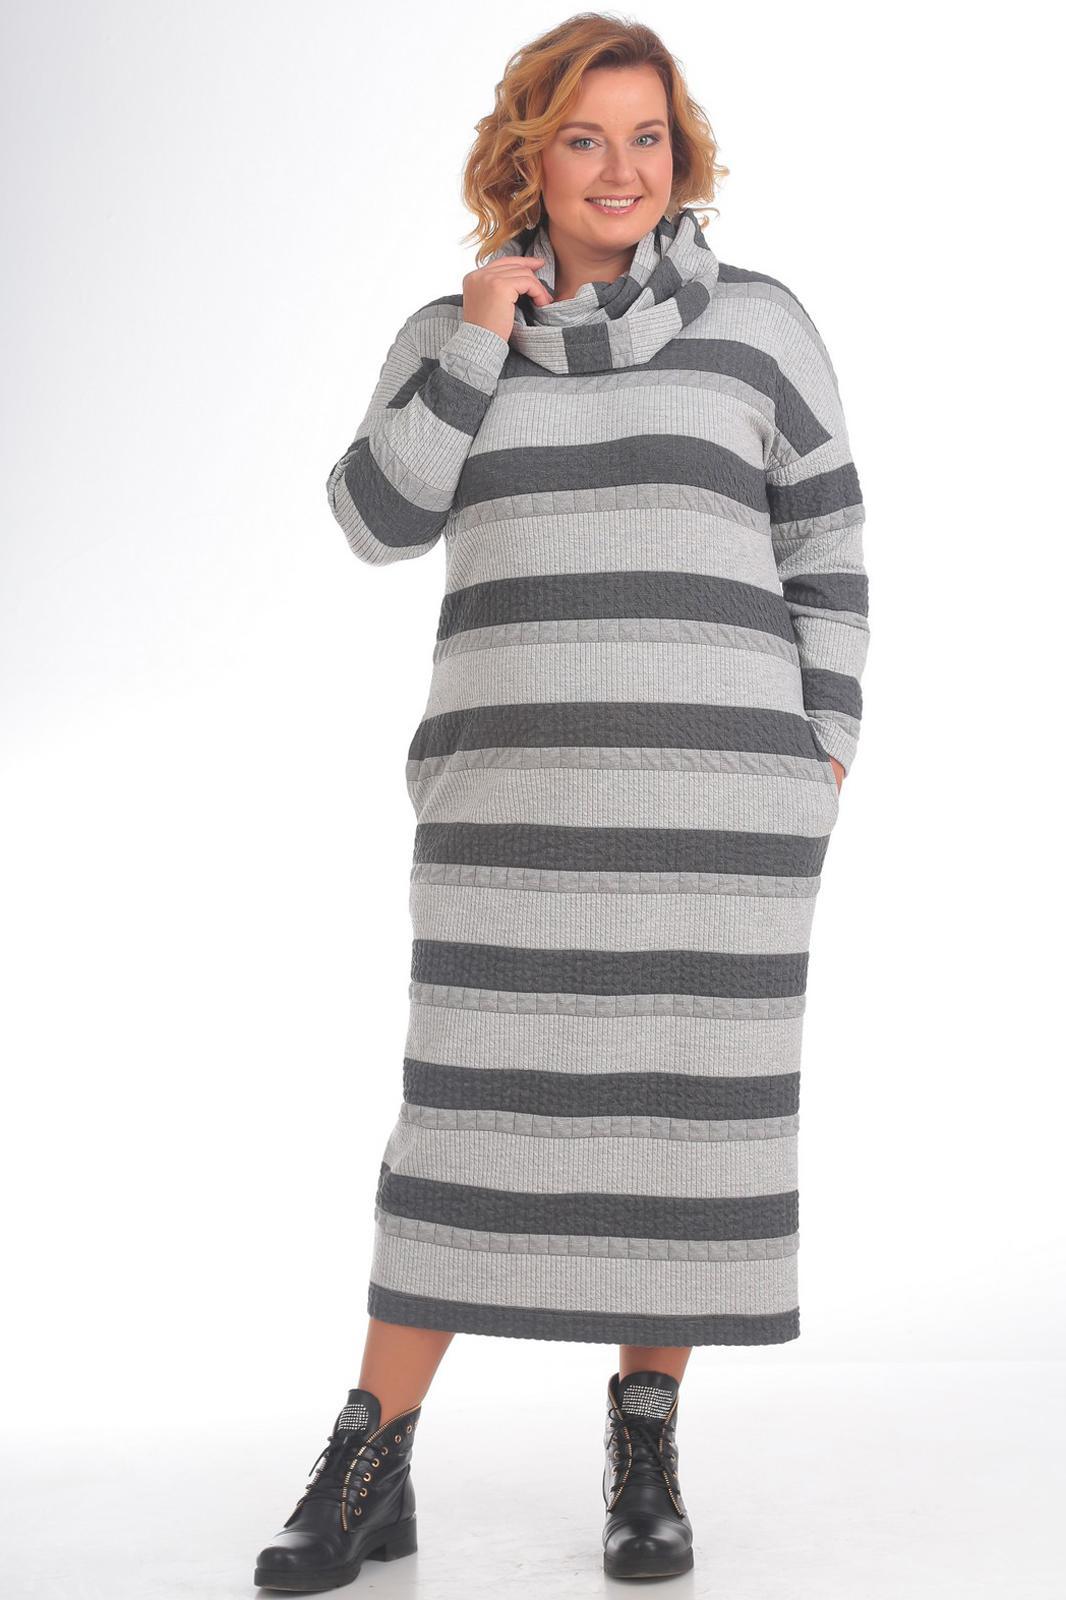 Купить Платье Pretty, 758 серебристый, Беларусь